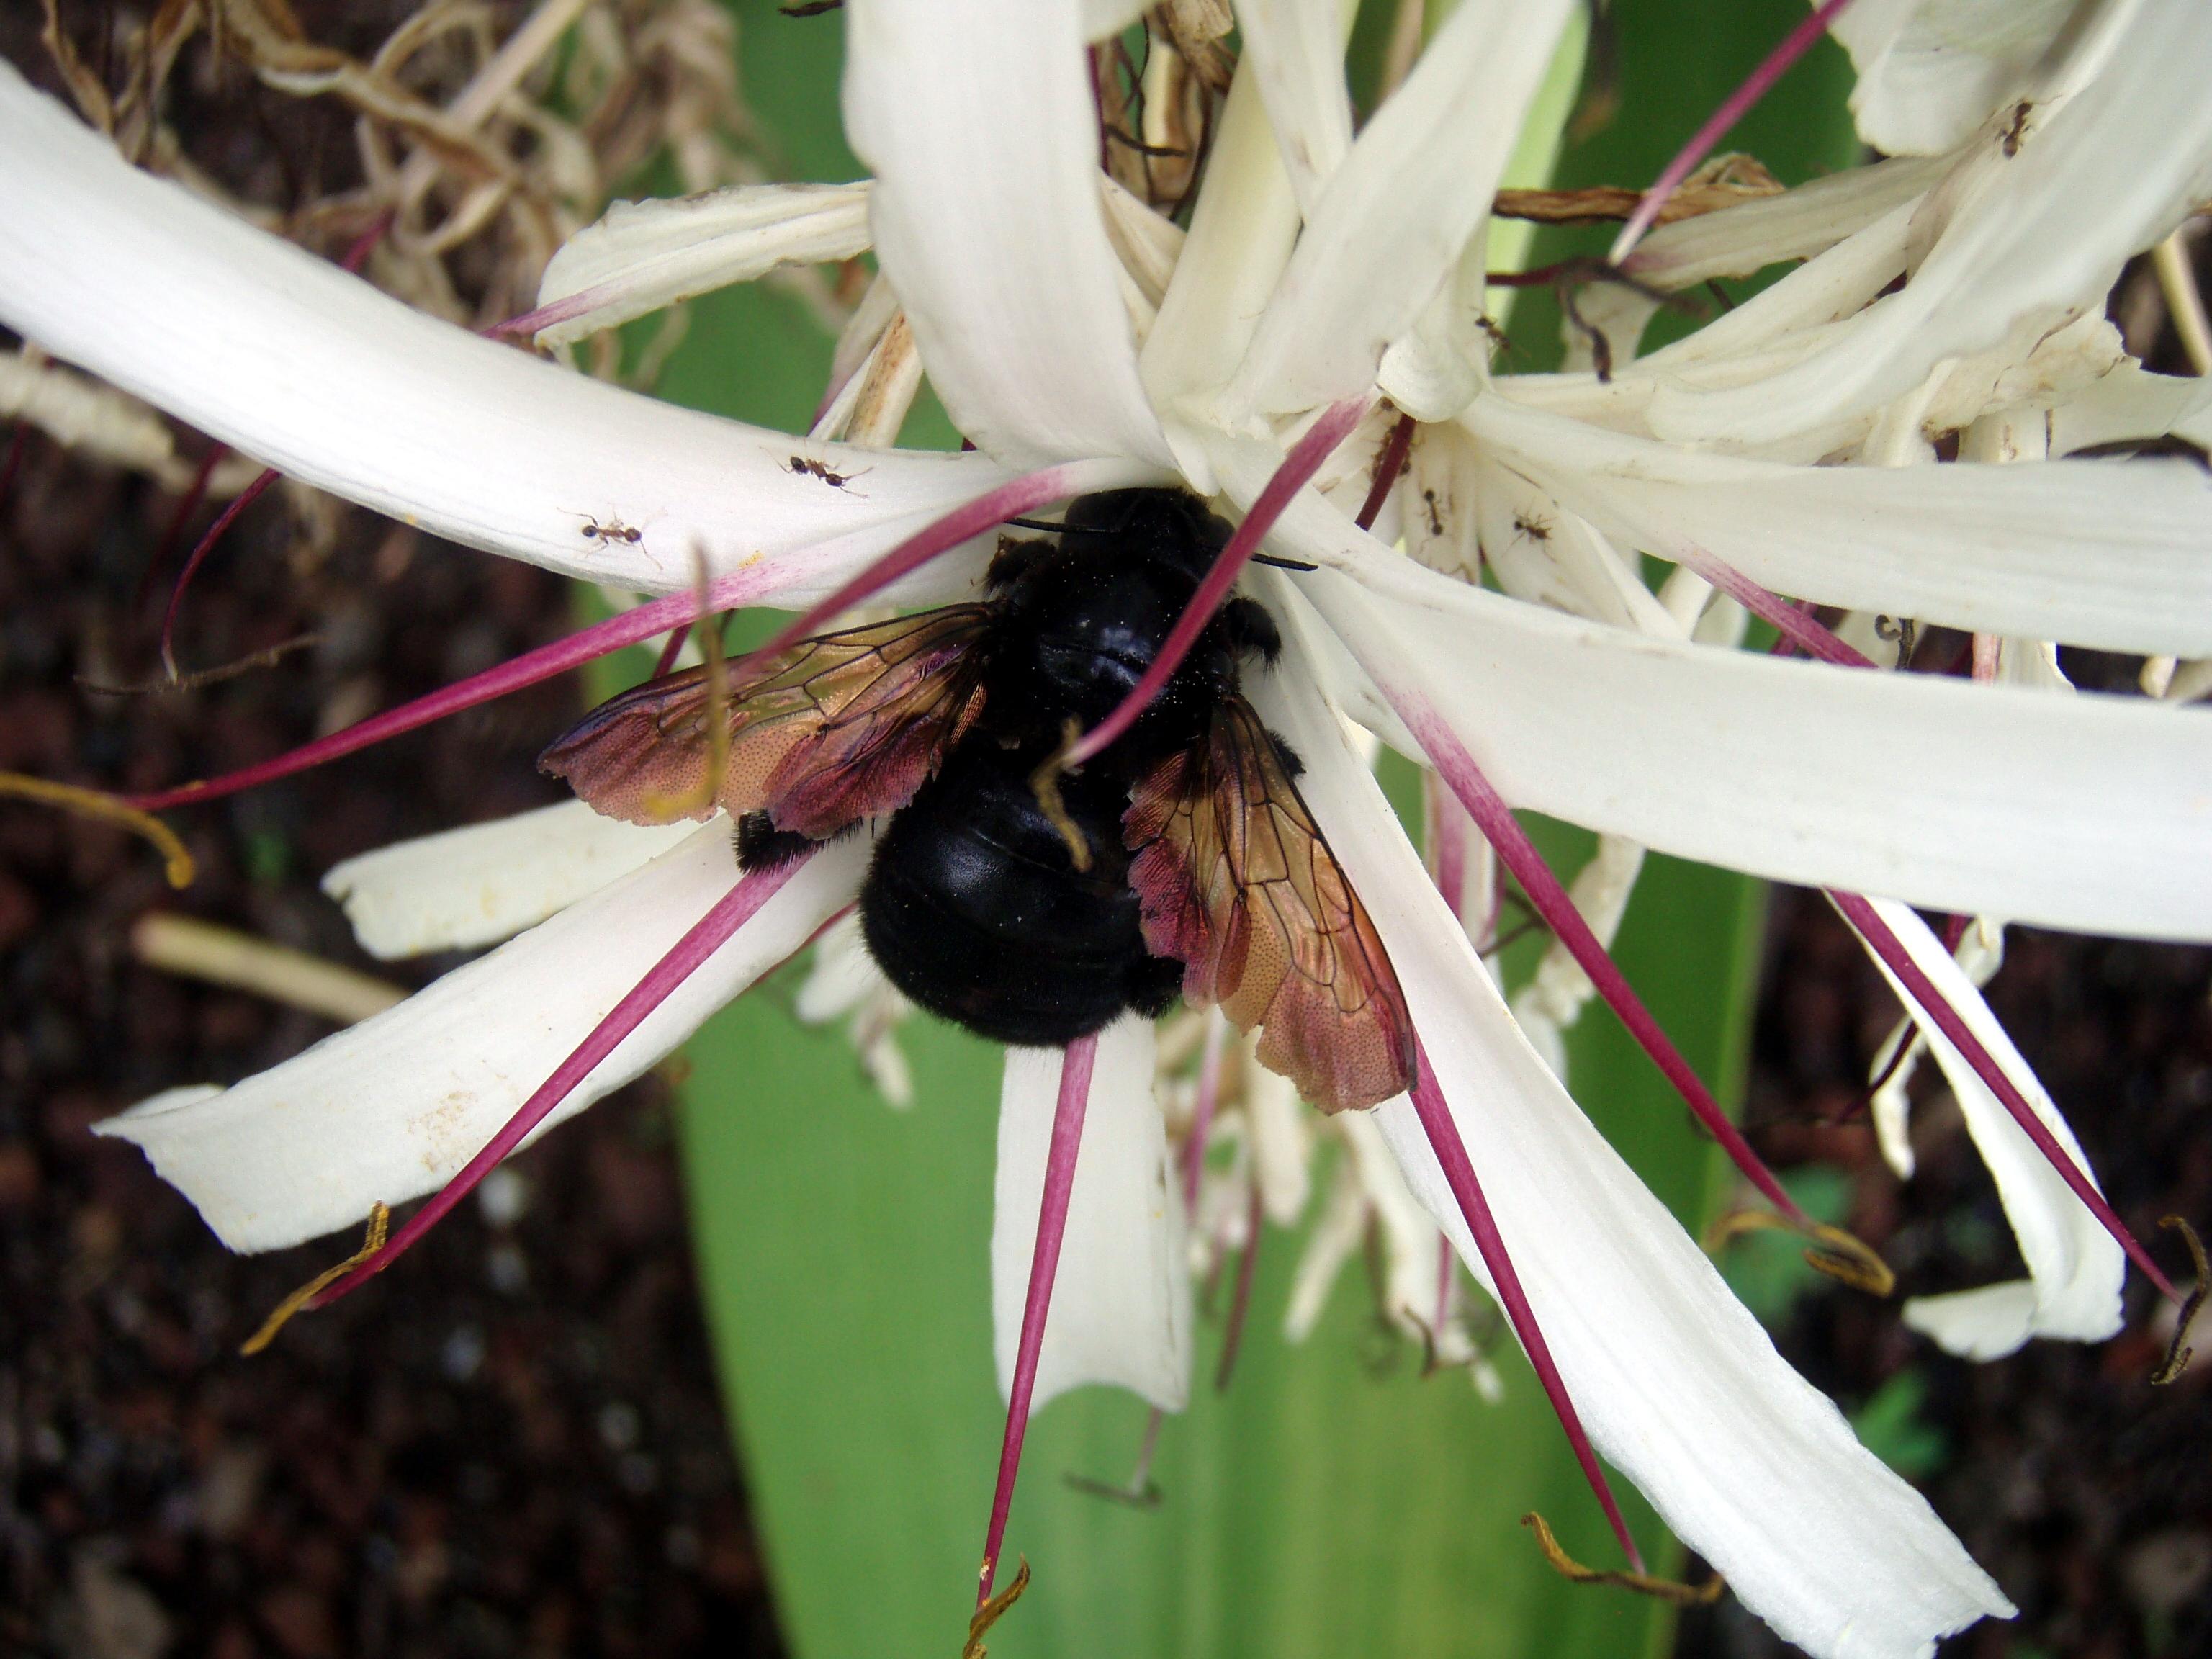 File:Carpenter Bee and ants in Kona.jpg - Wikimedia Commons